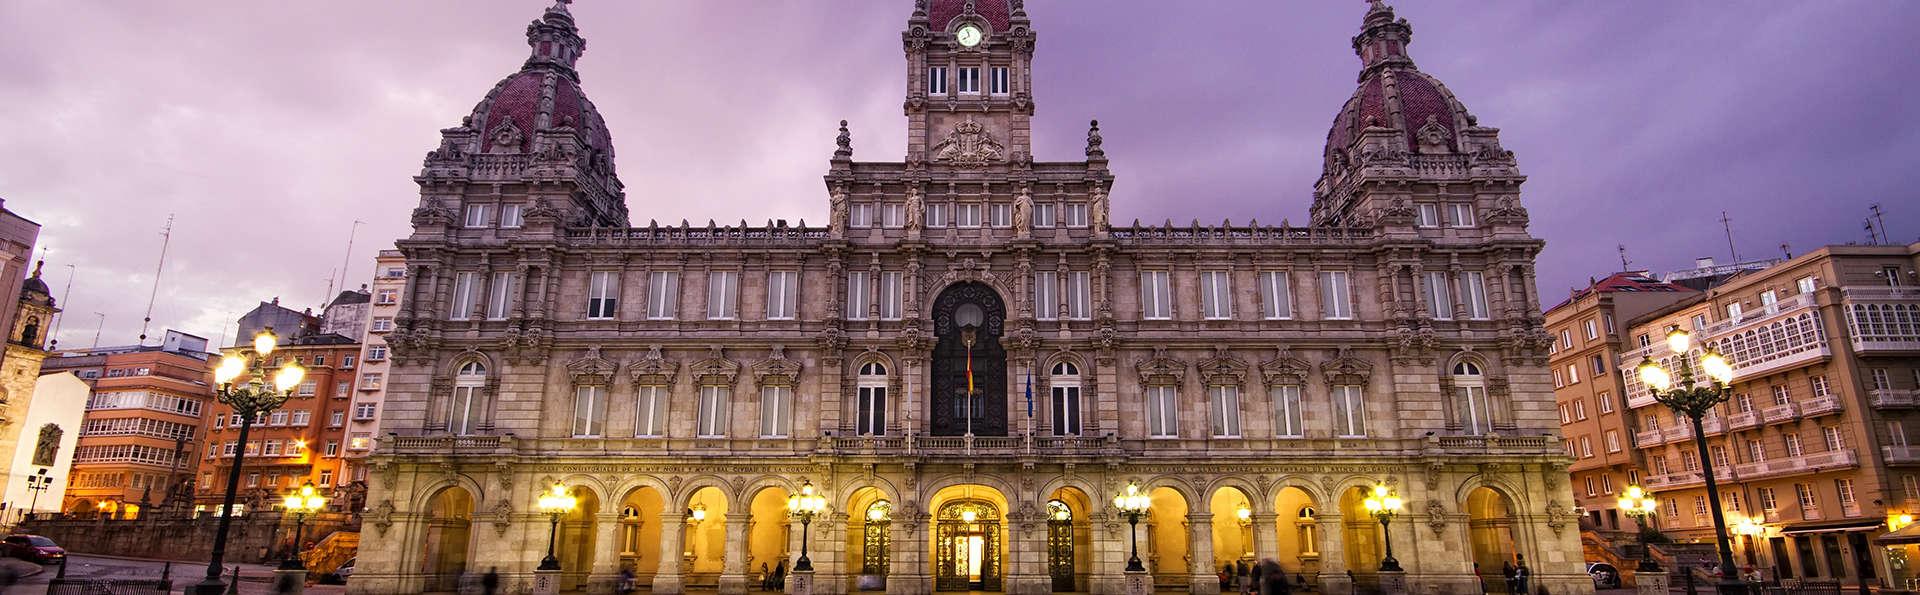 Hotel Plaza - A Coruña - Edit_Destination2.jpg